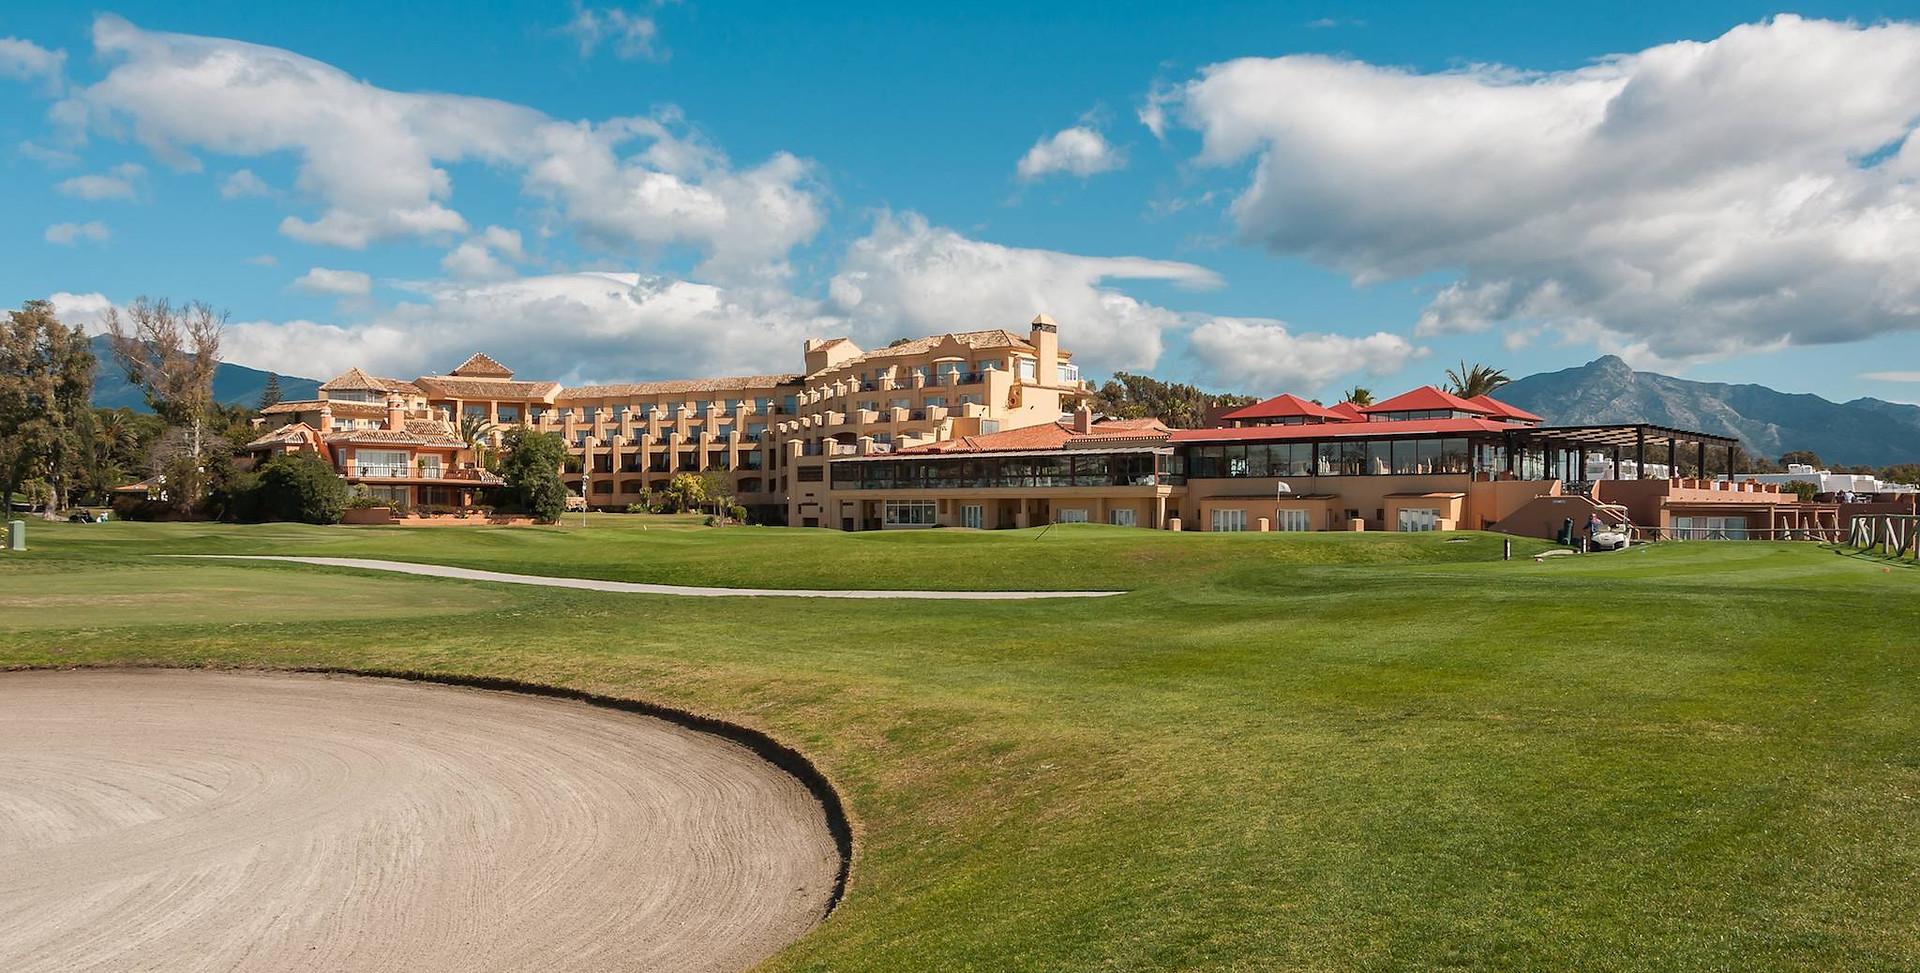 hotel-guadalmina-spa&golf-puregolf-6.jpg